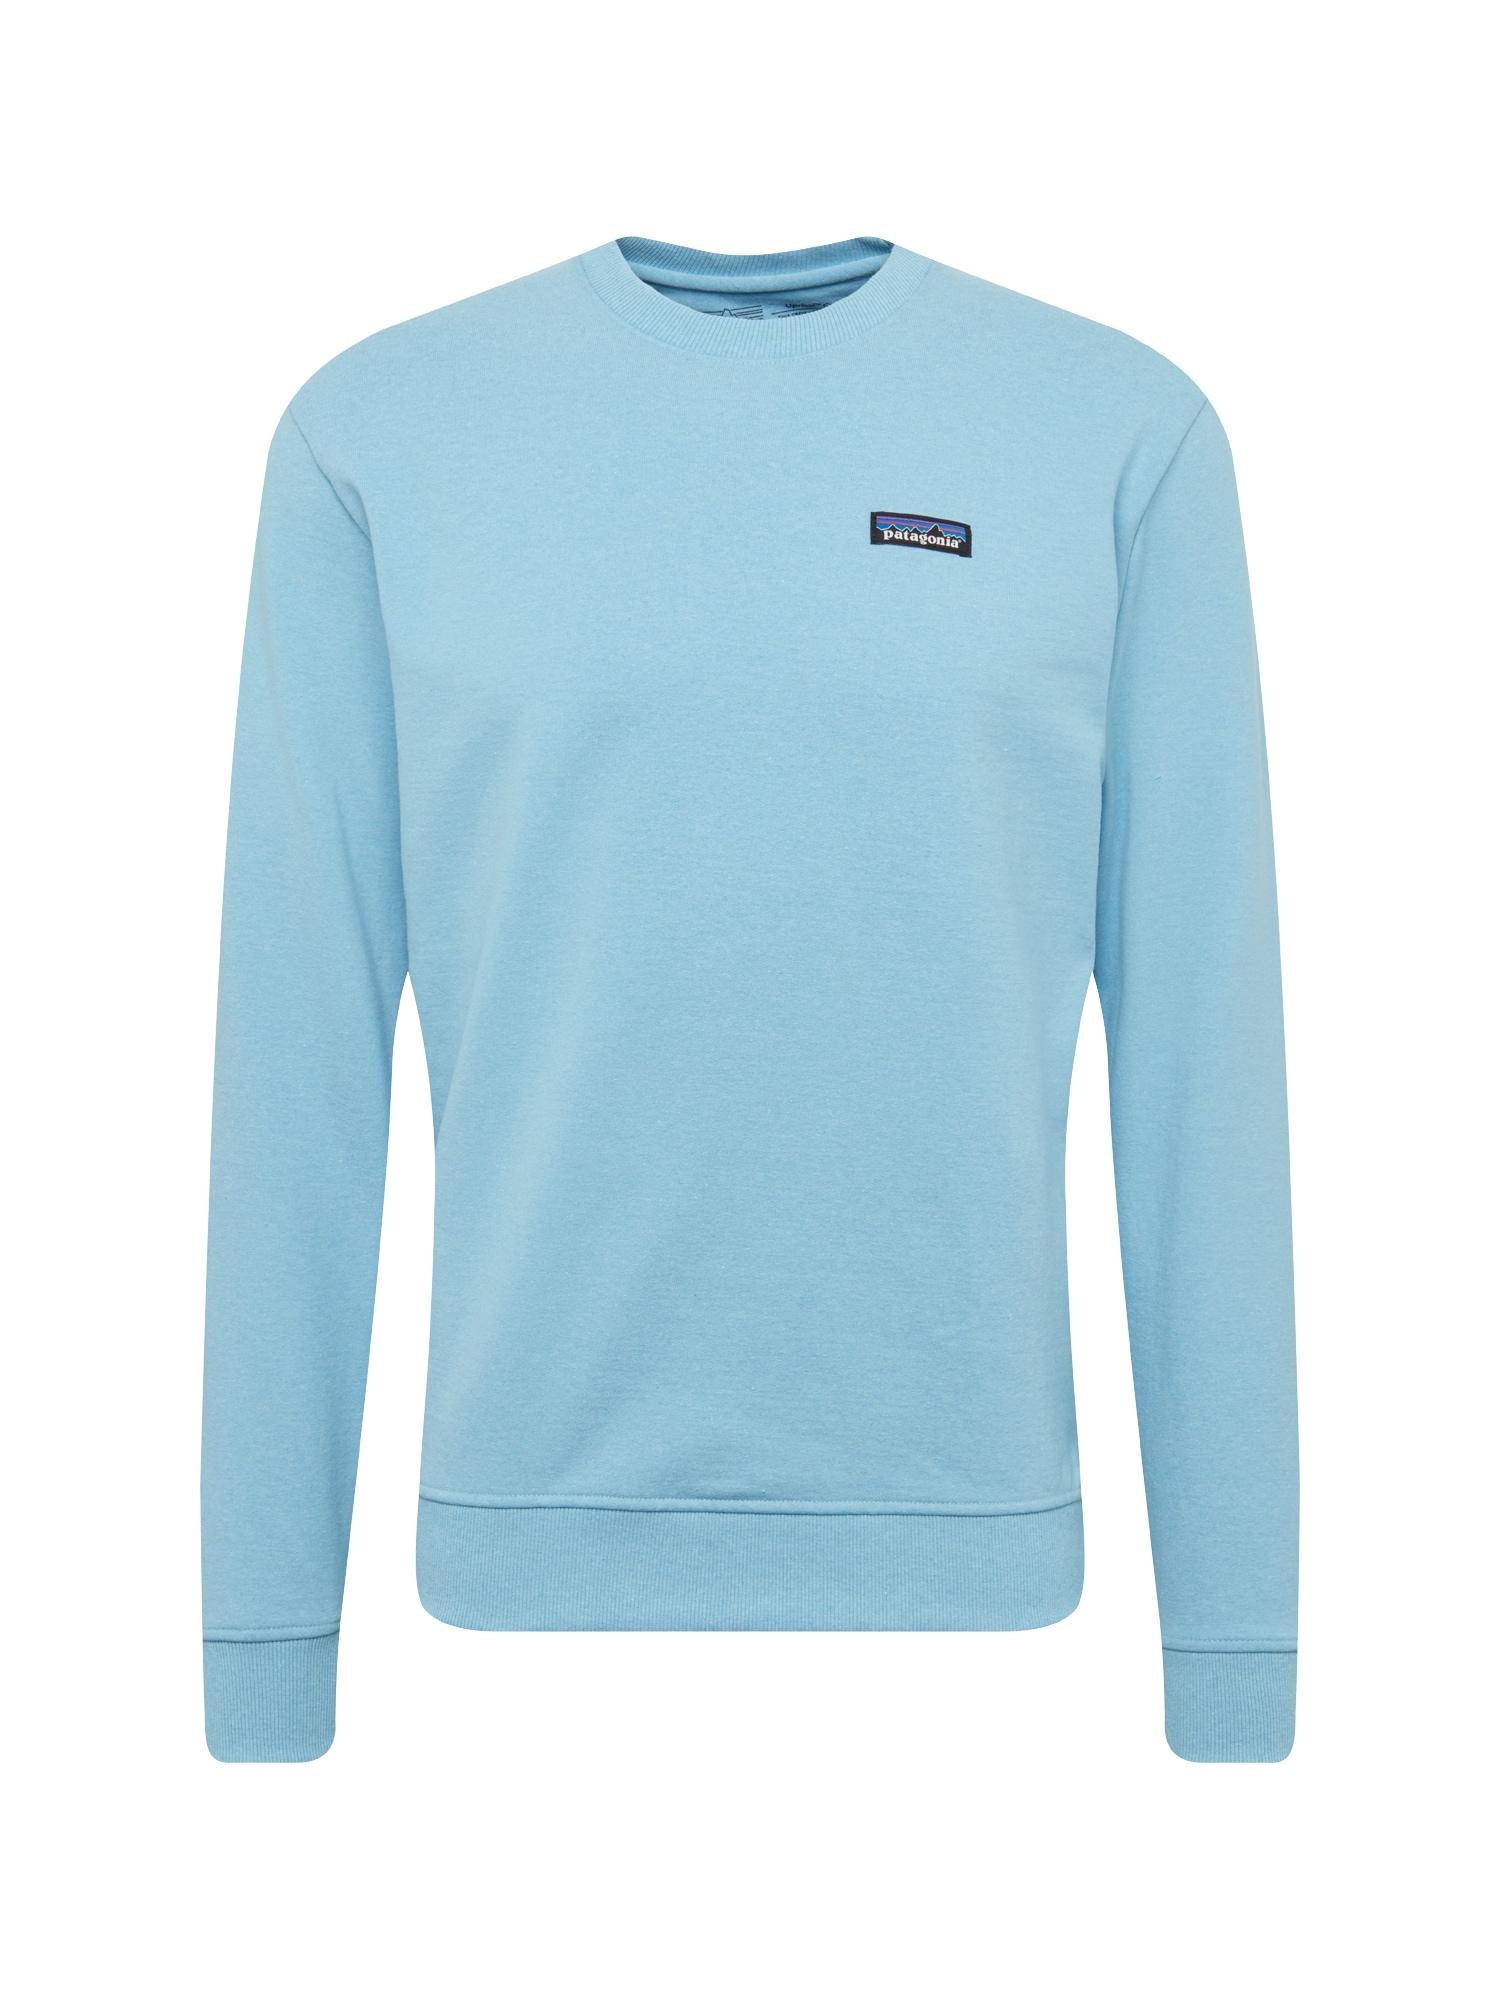 Mikina Ms P-6 Label Uprisal Crew Sweatshirt tmavě modrá PATAGONIA